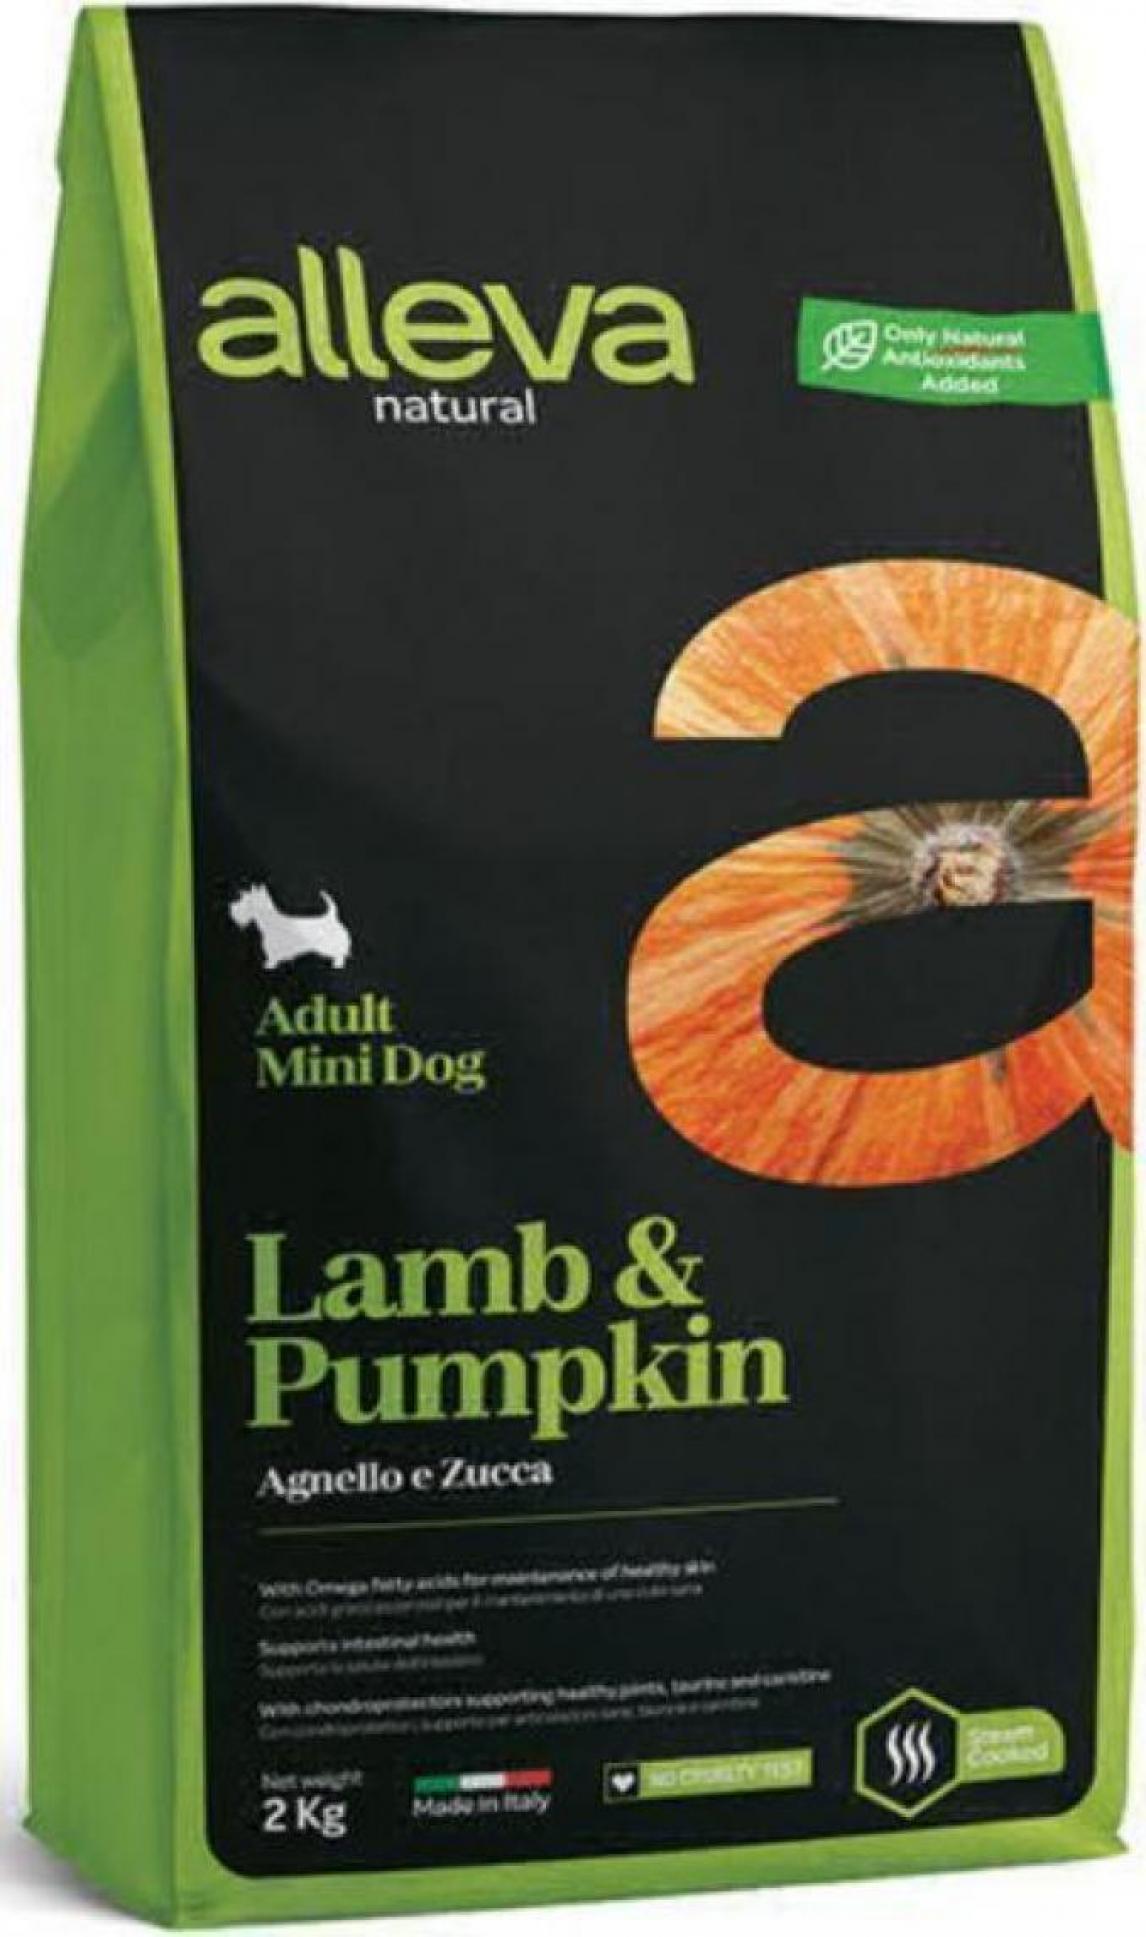 ALLEVA NATURAL DOG длЯ собак Adult Lamb & Pumpkin Mini  взрослых с ягненком и тыквой 2кг 2110